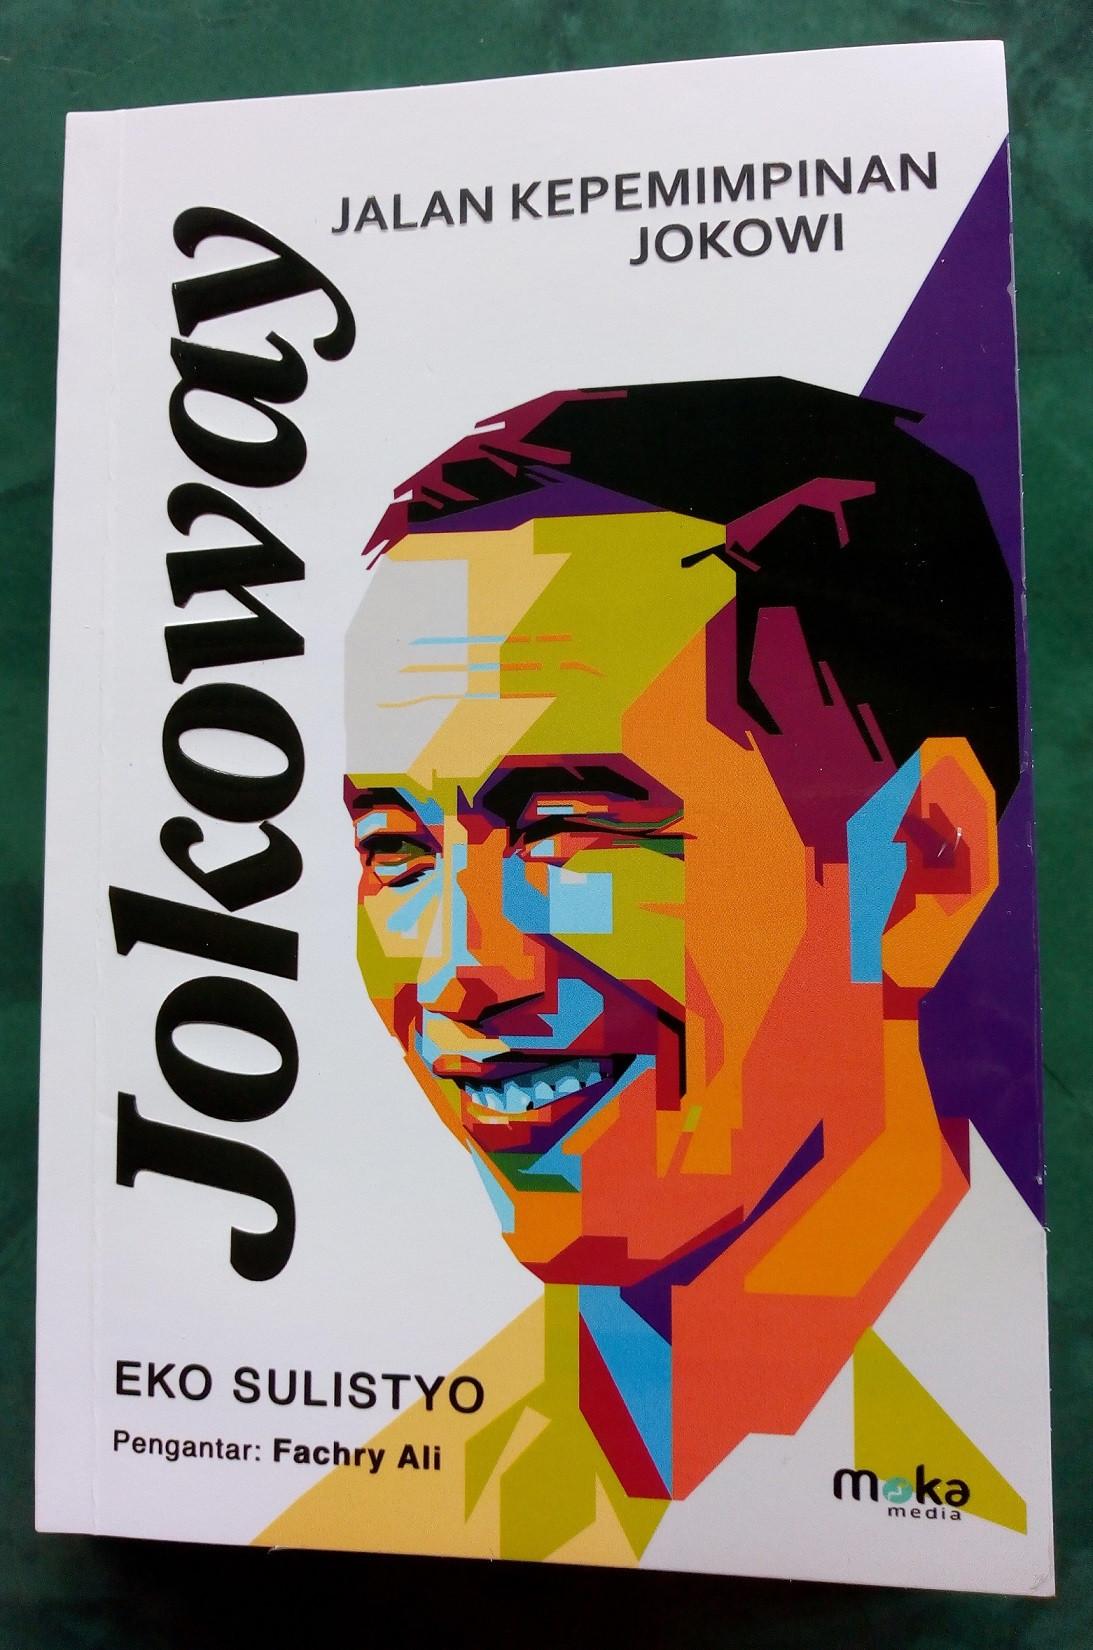 'Jokoway': New definition of Jokowi's fluid leadership